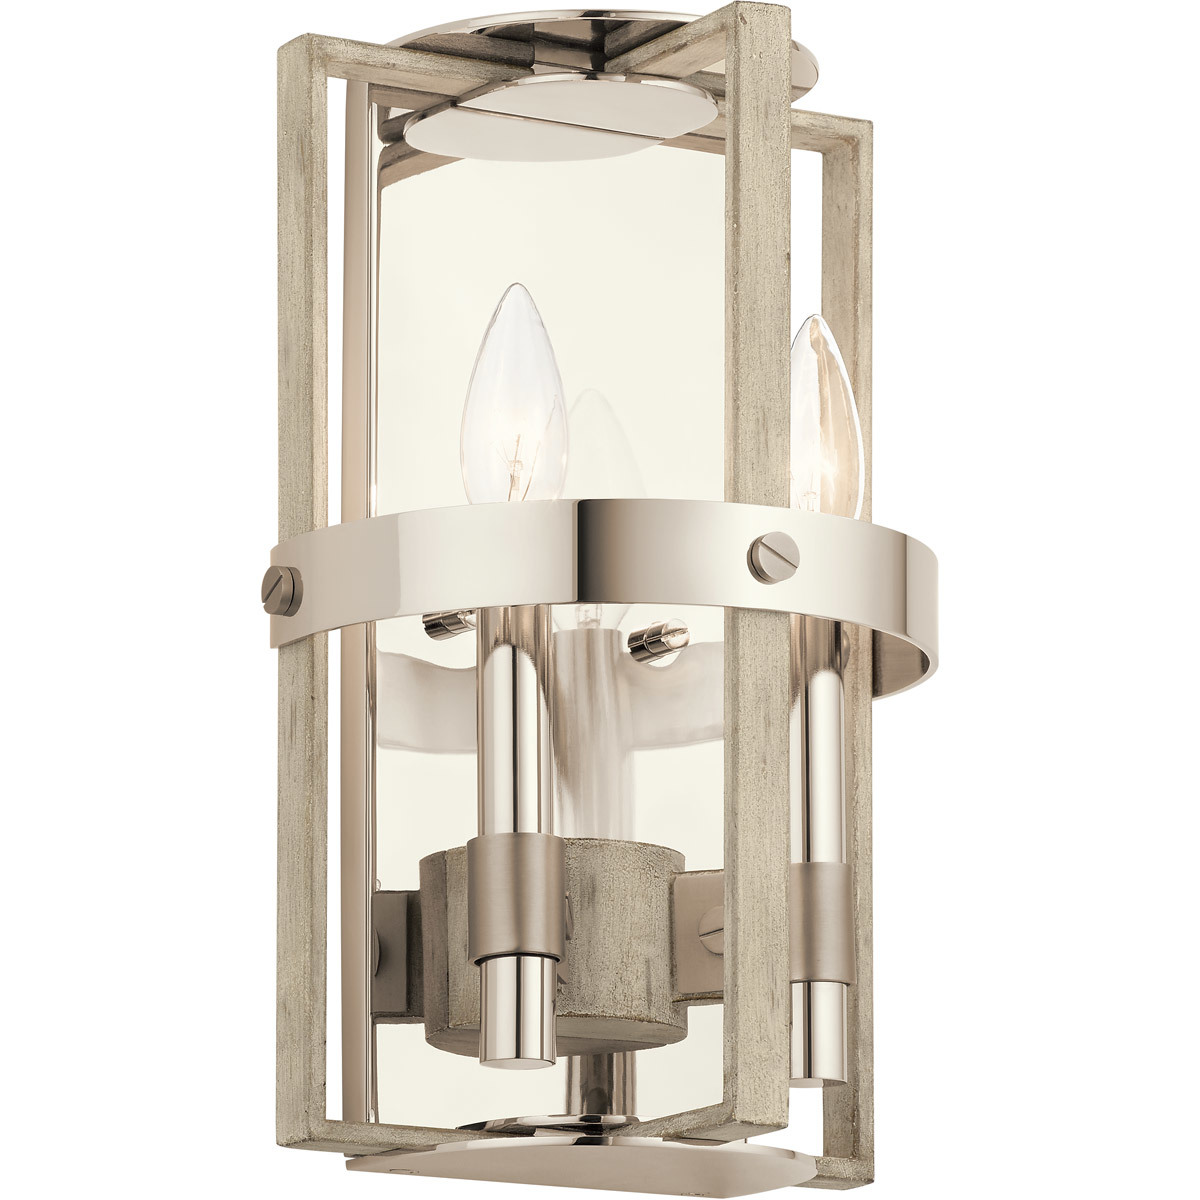 Kichler Lighting 44292WWW Wall Sconces White Washed Wood Steel Peyton - $309.99